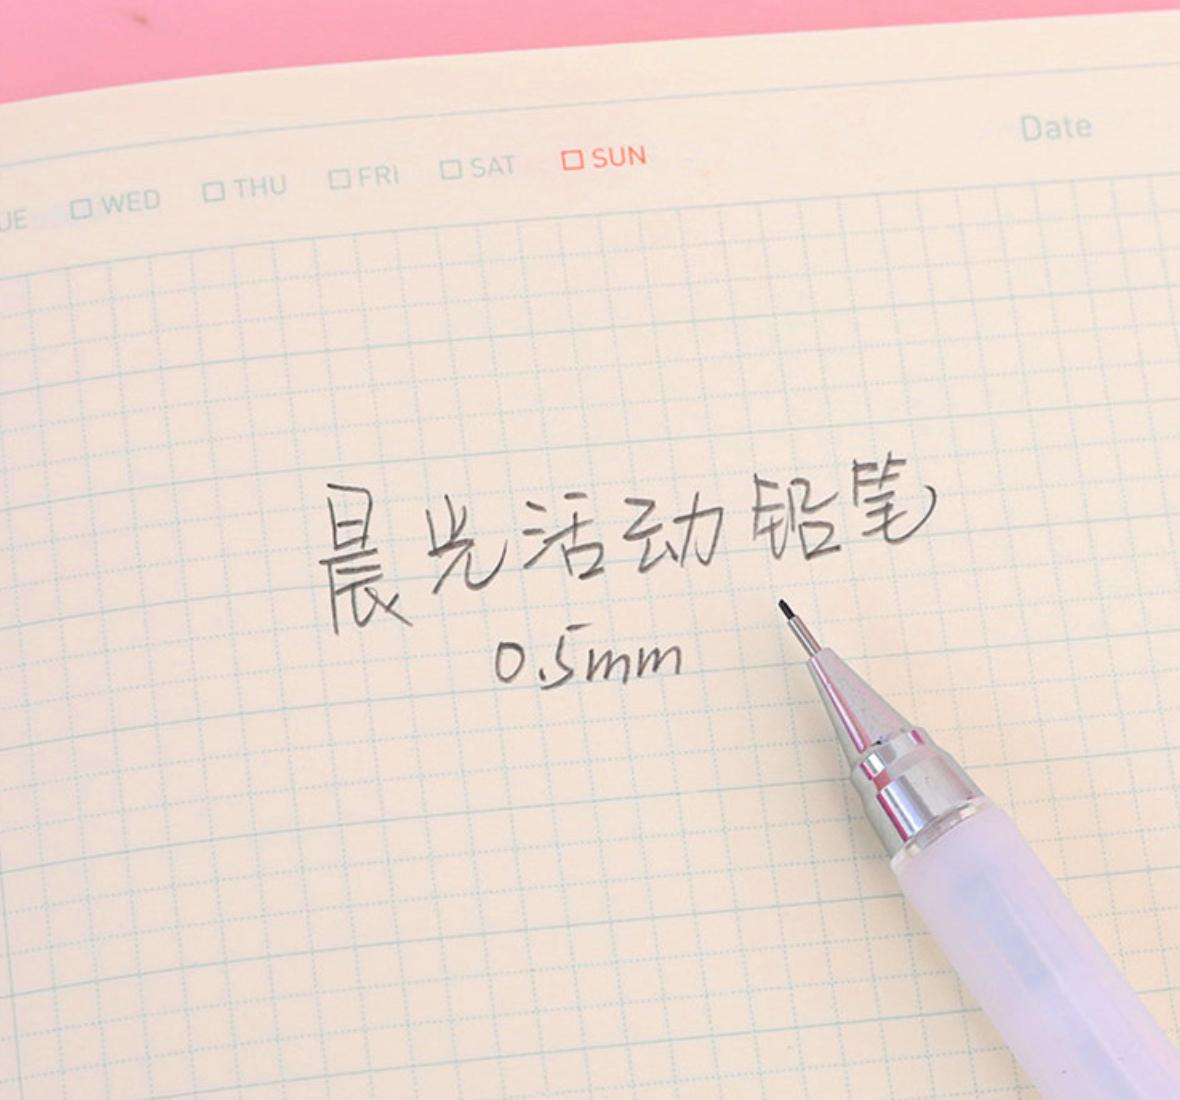 0.5mm Clean Mechanical Pencil